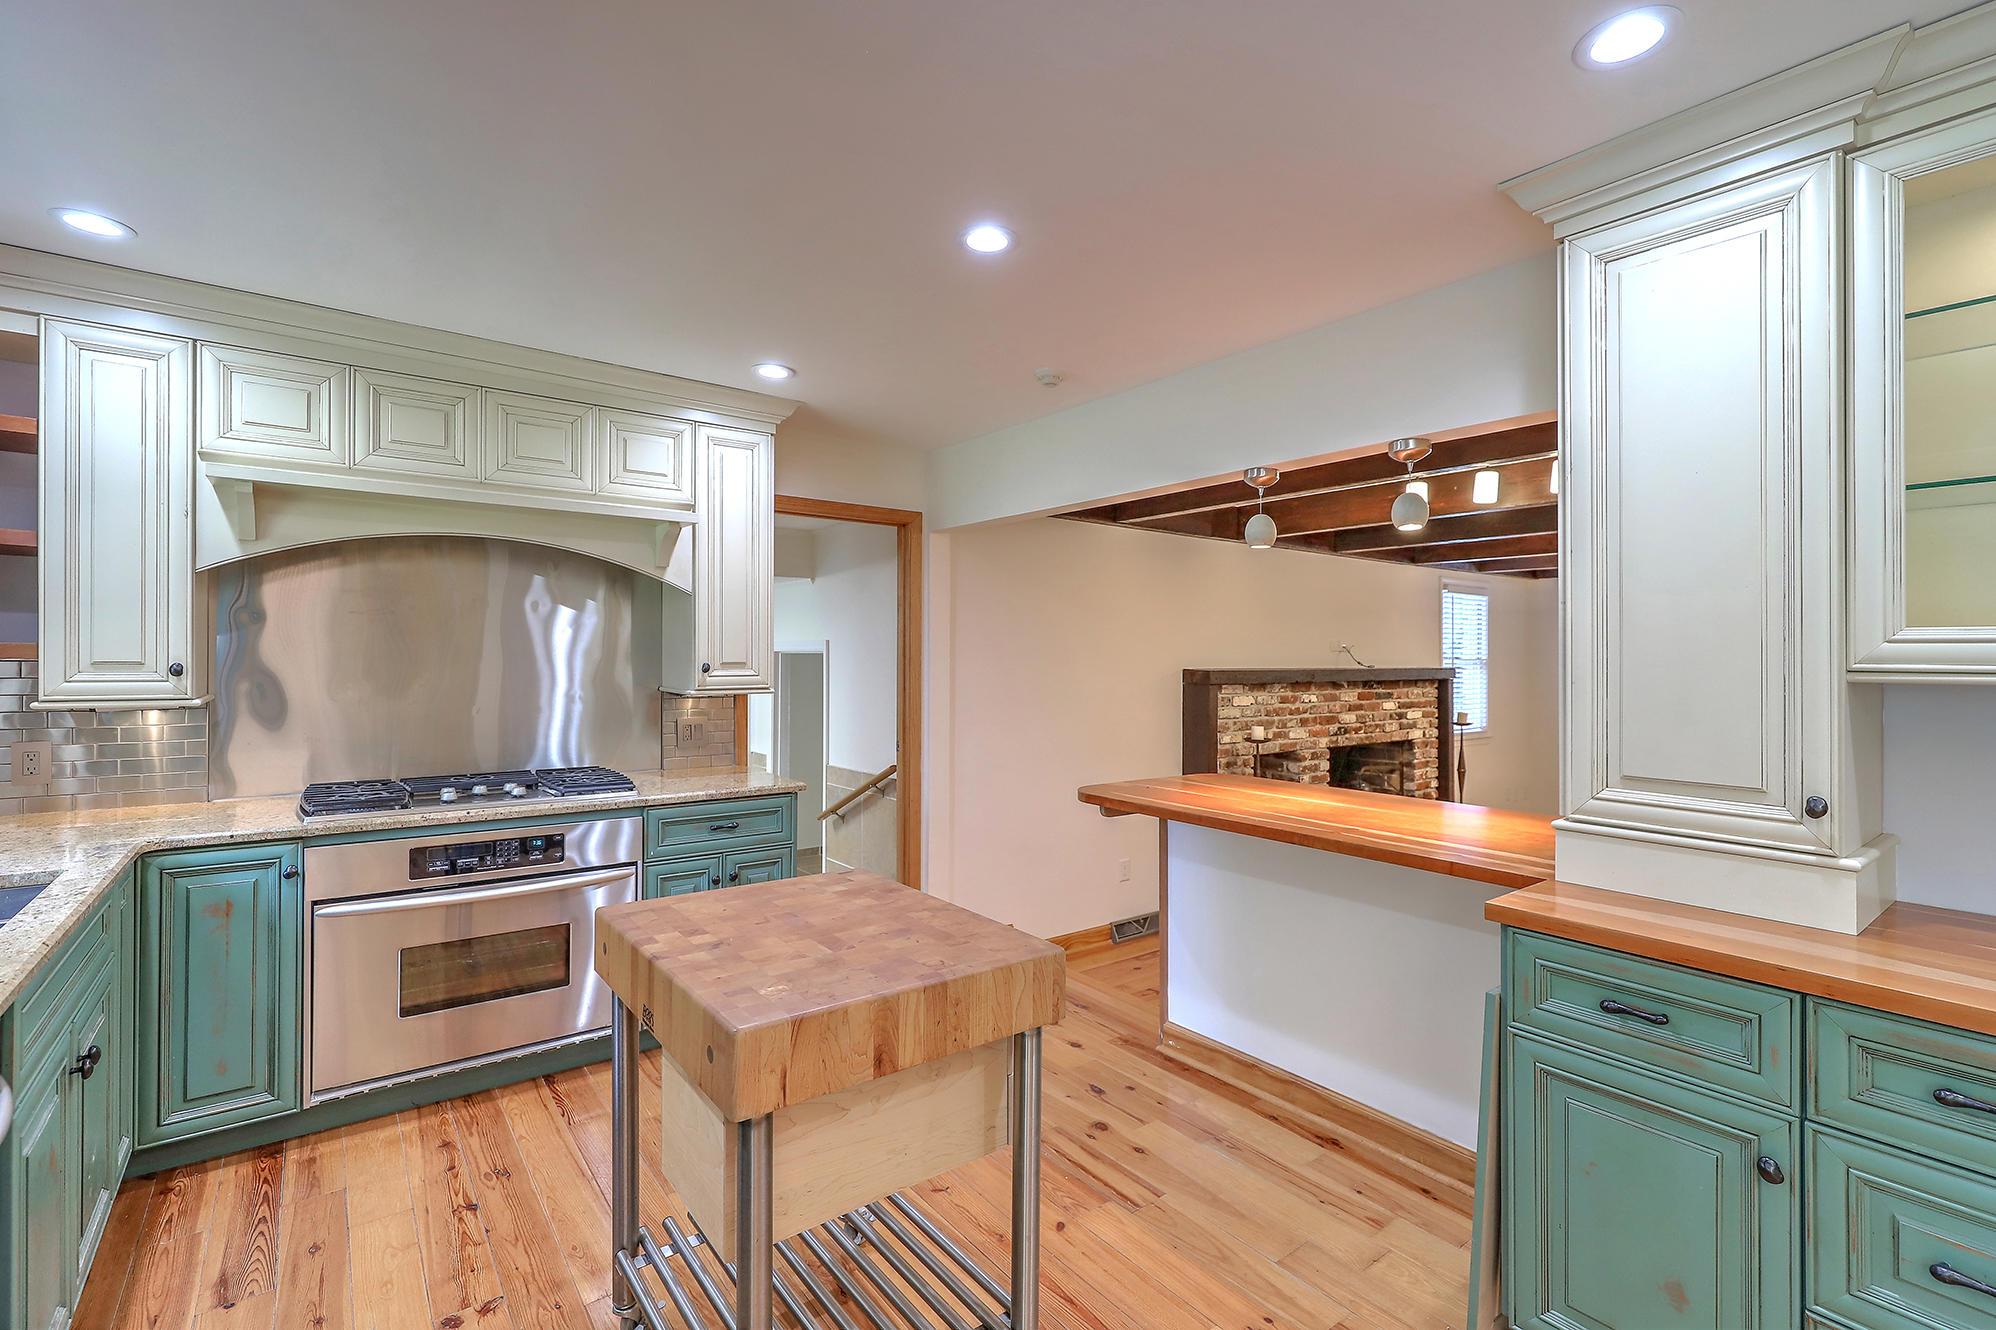 Edgewater Park Homes For Sale - 1413 Edsent, Charleston, SC - 34